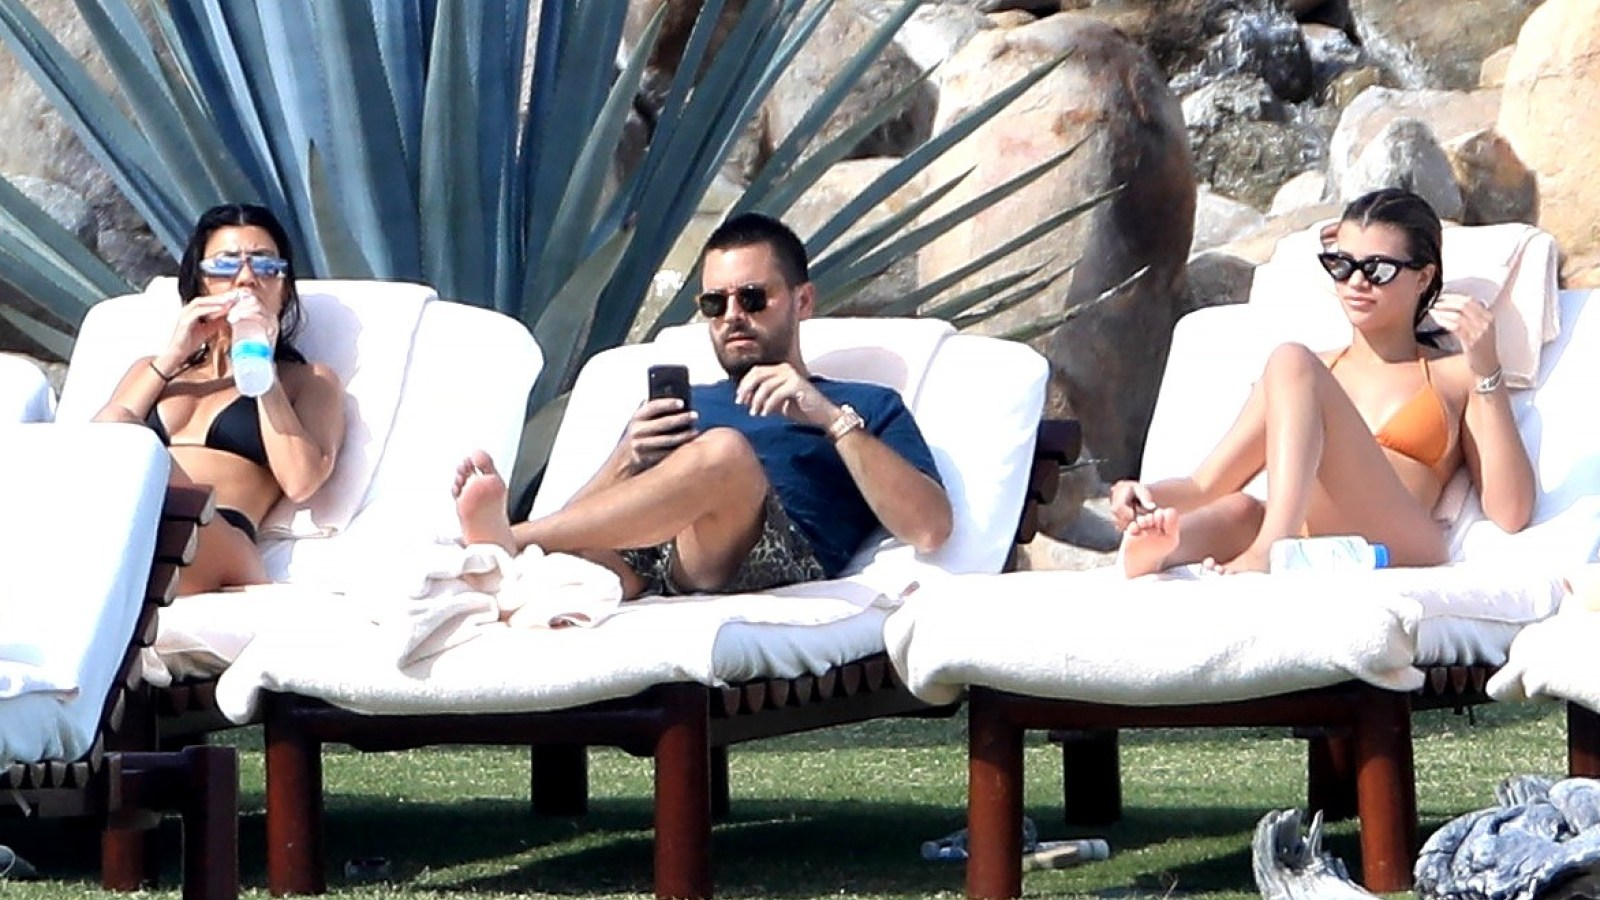 Sofia Richie Shocks Everyone By Posting A Photo With Scott Disick And Kourtney Kardashian: 'We All Love You'